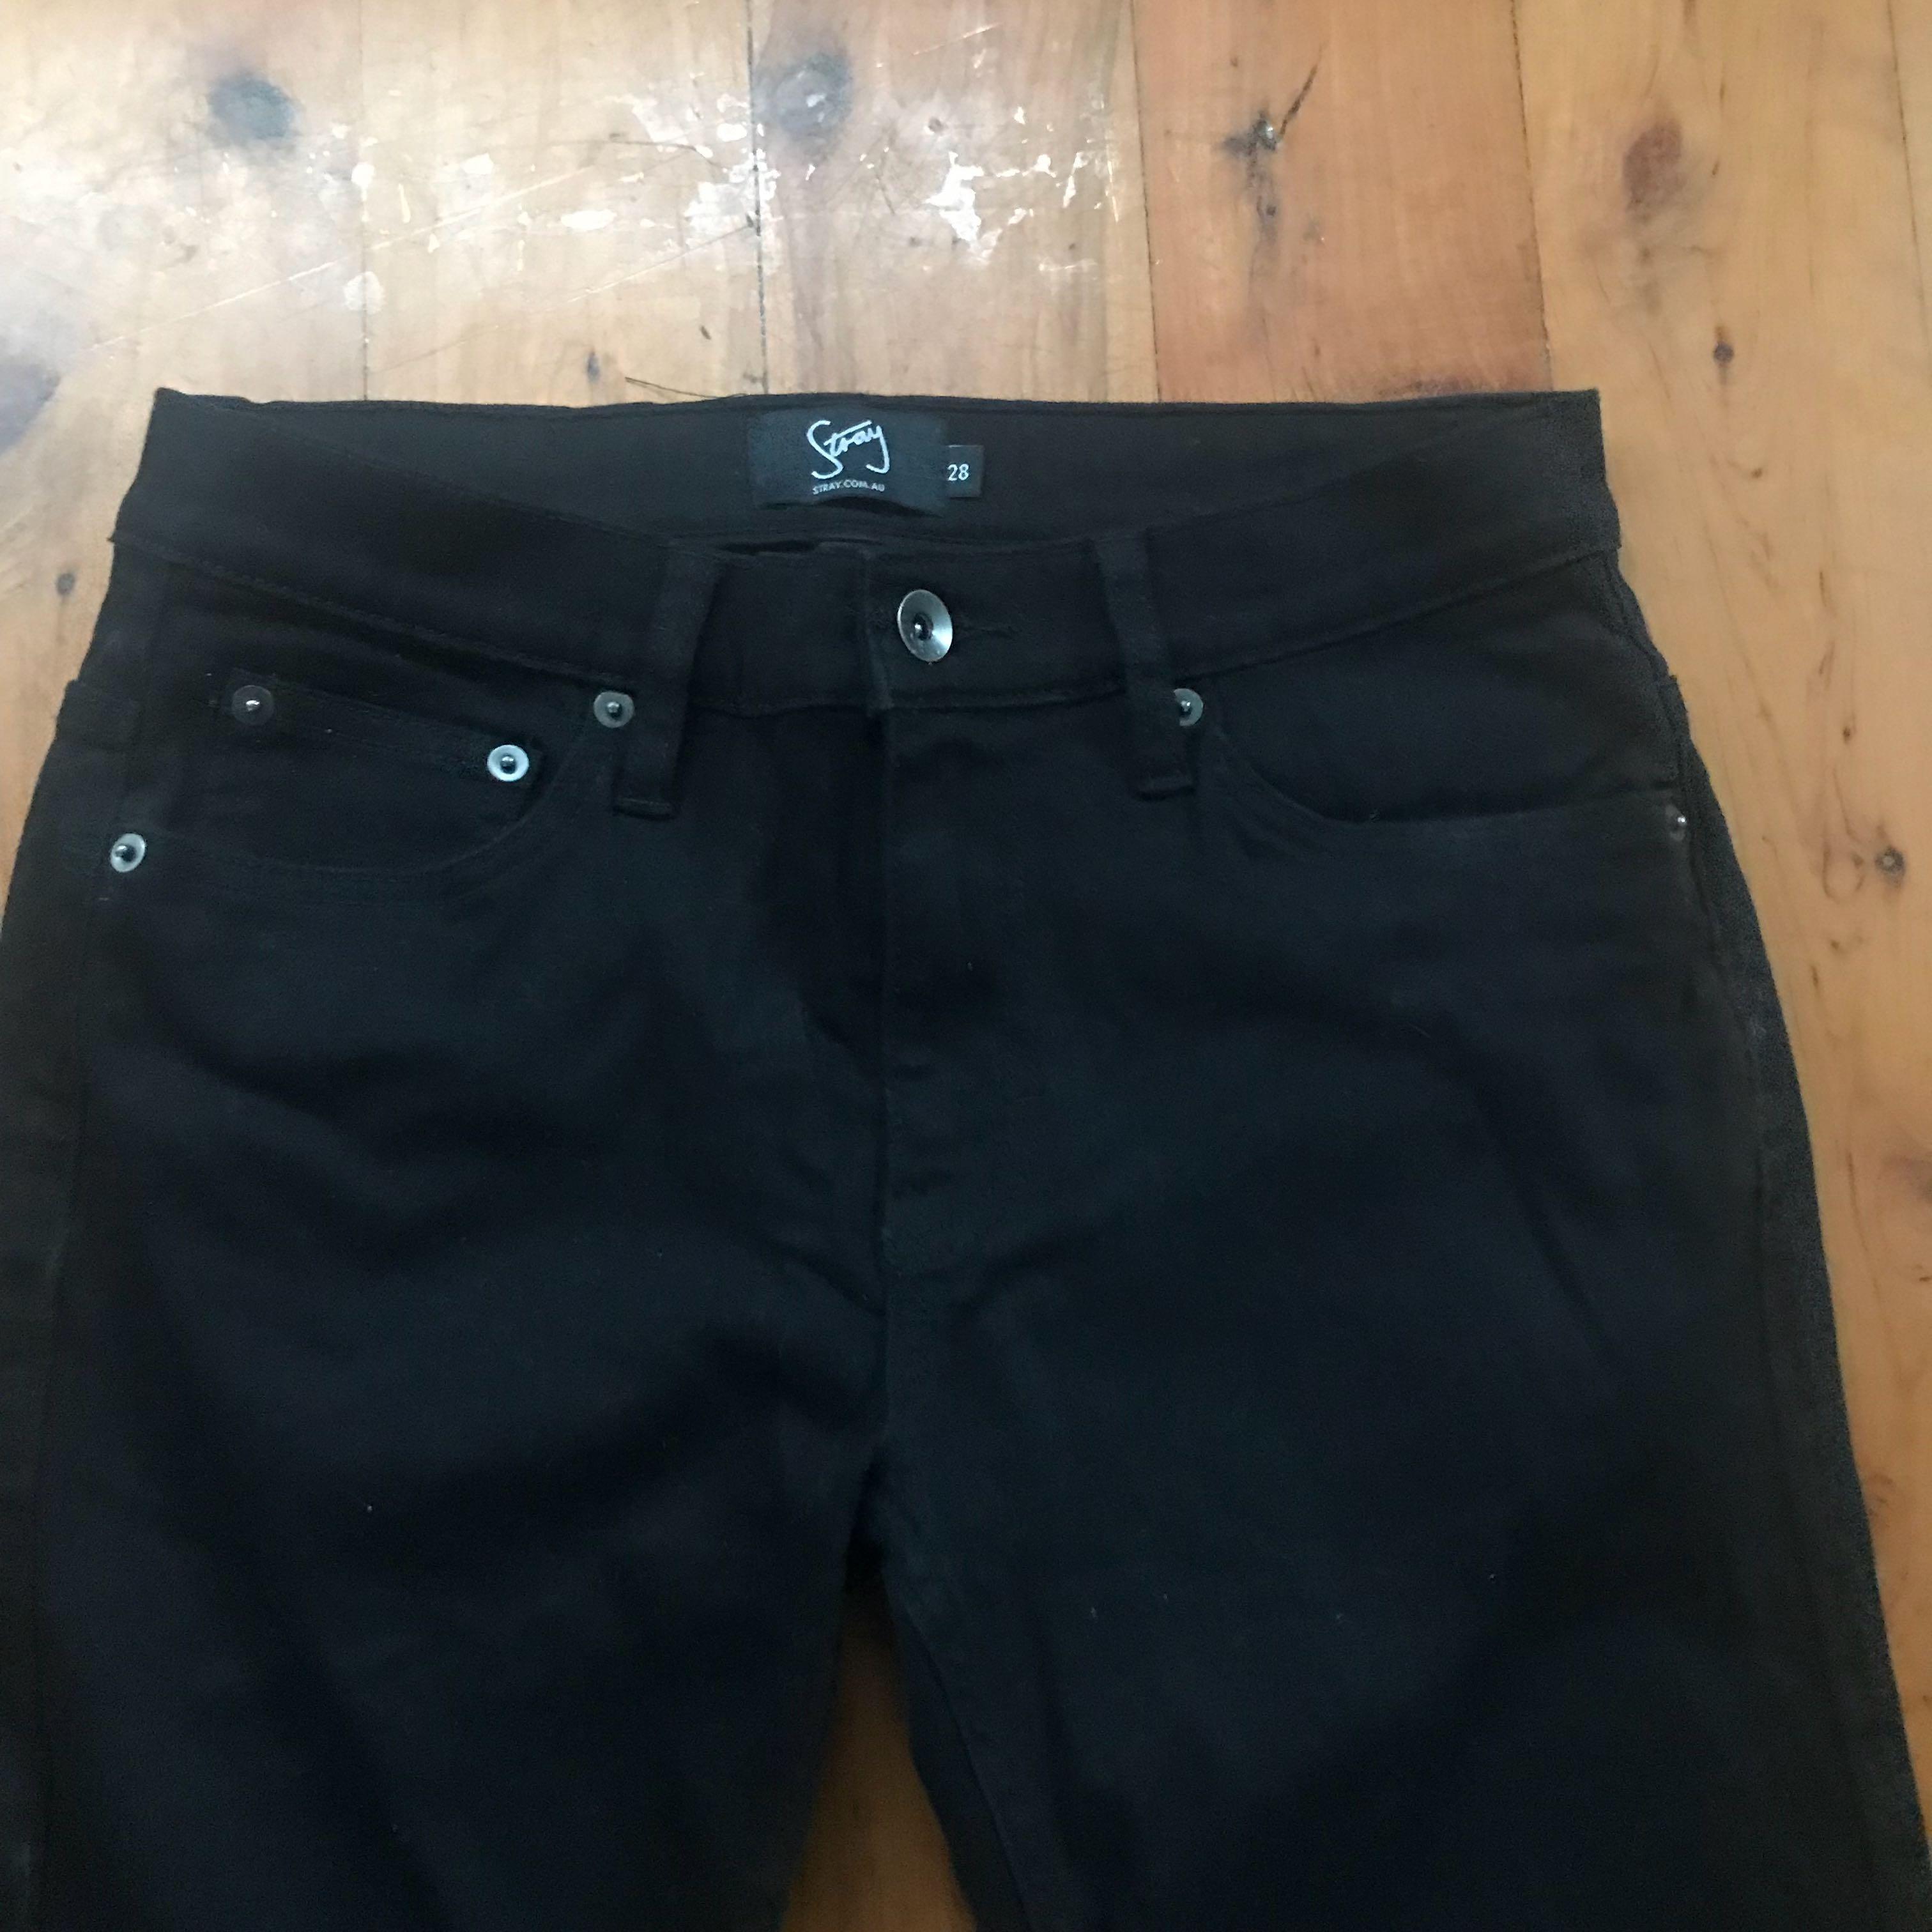 Women's new skinny leg stray denim jeans dark black size 28